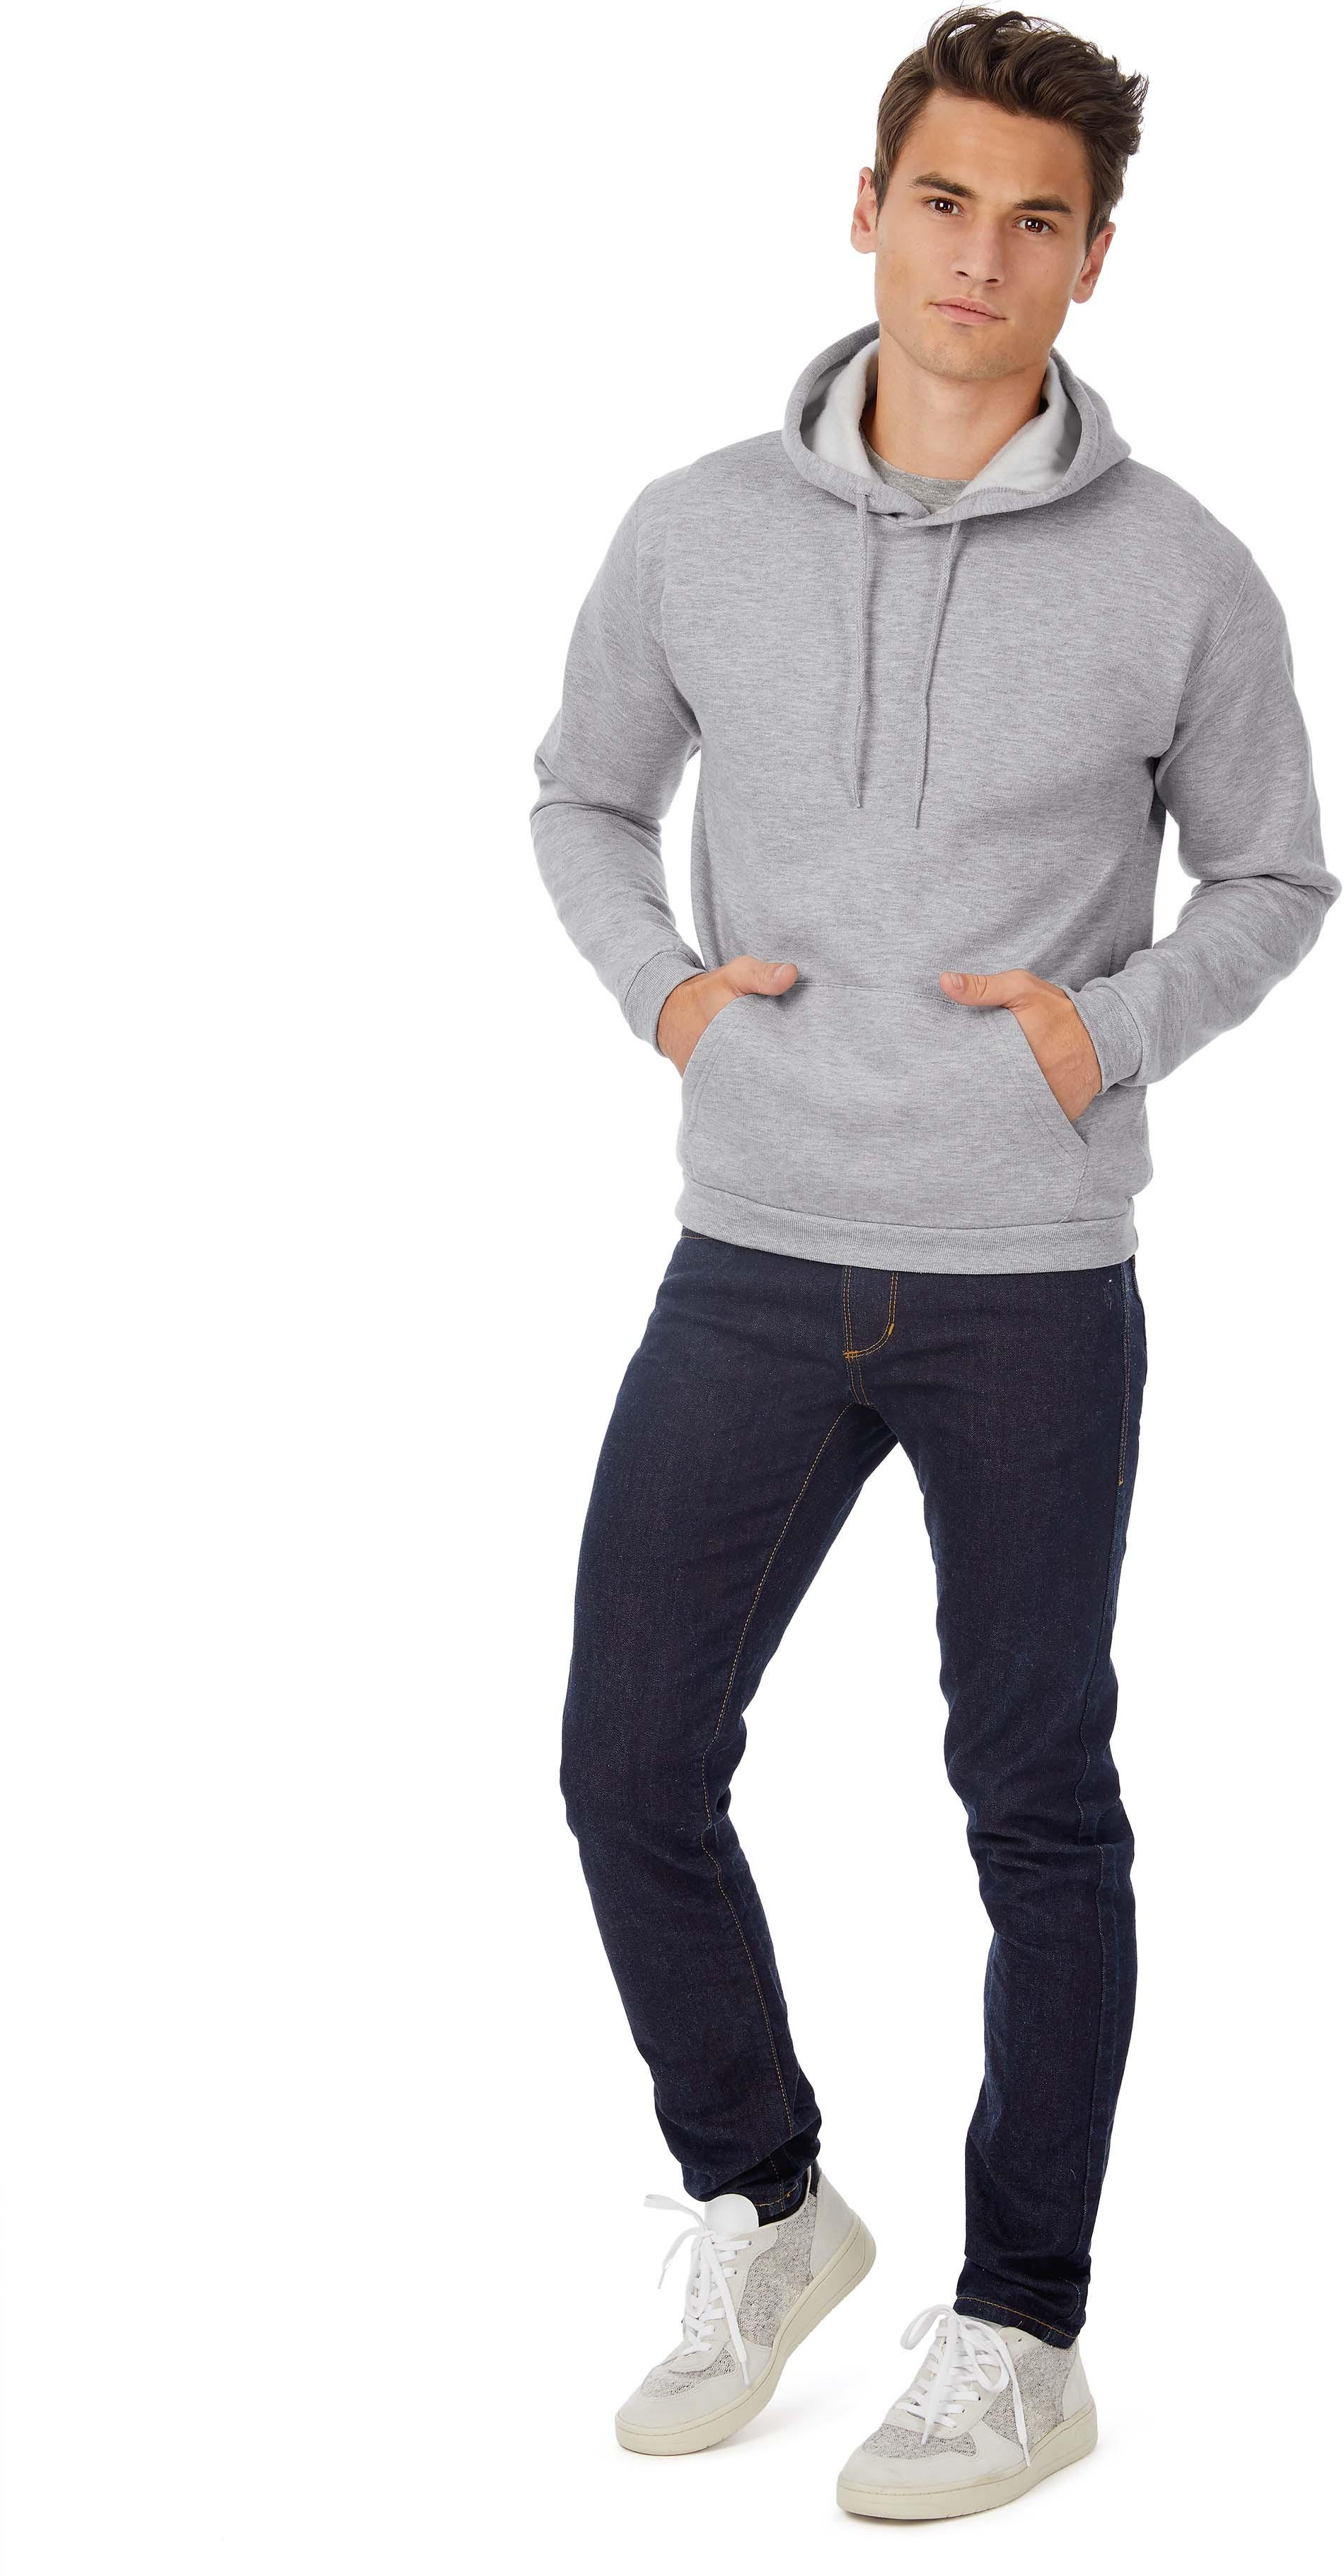 B&C Sweatshirt capuche ID.203